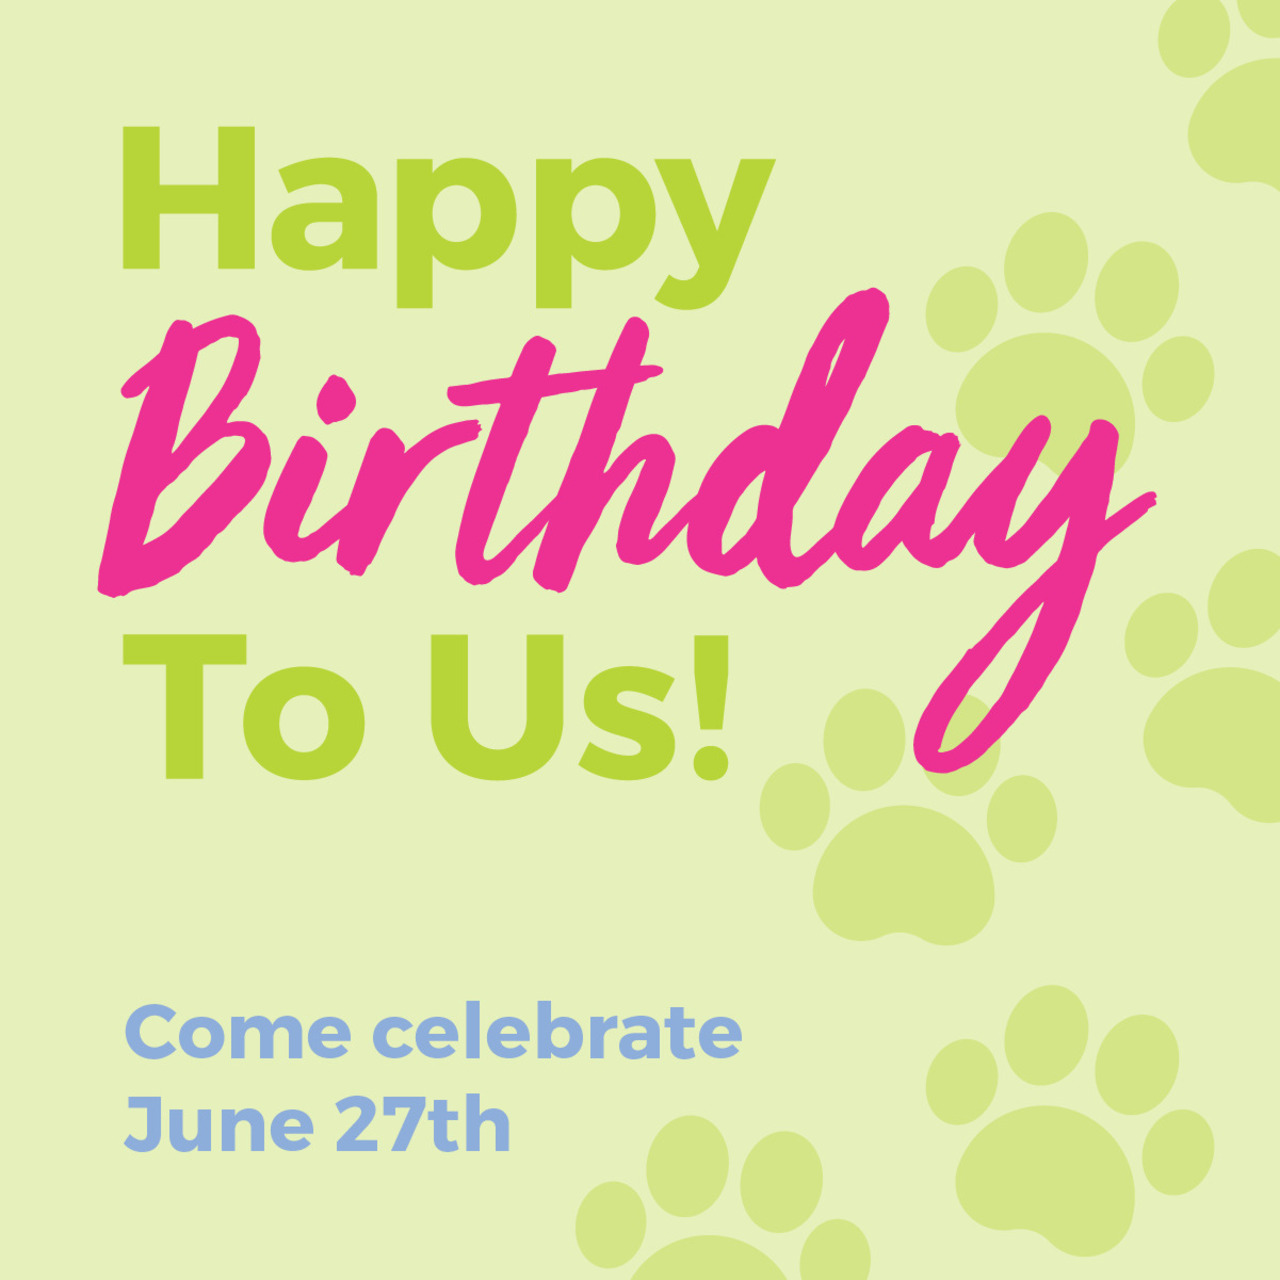 HSWM 138th Birthday Party